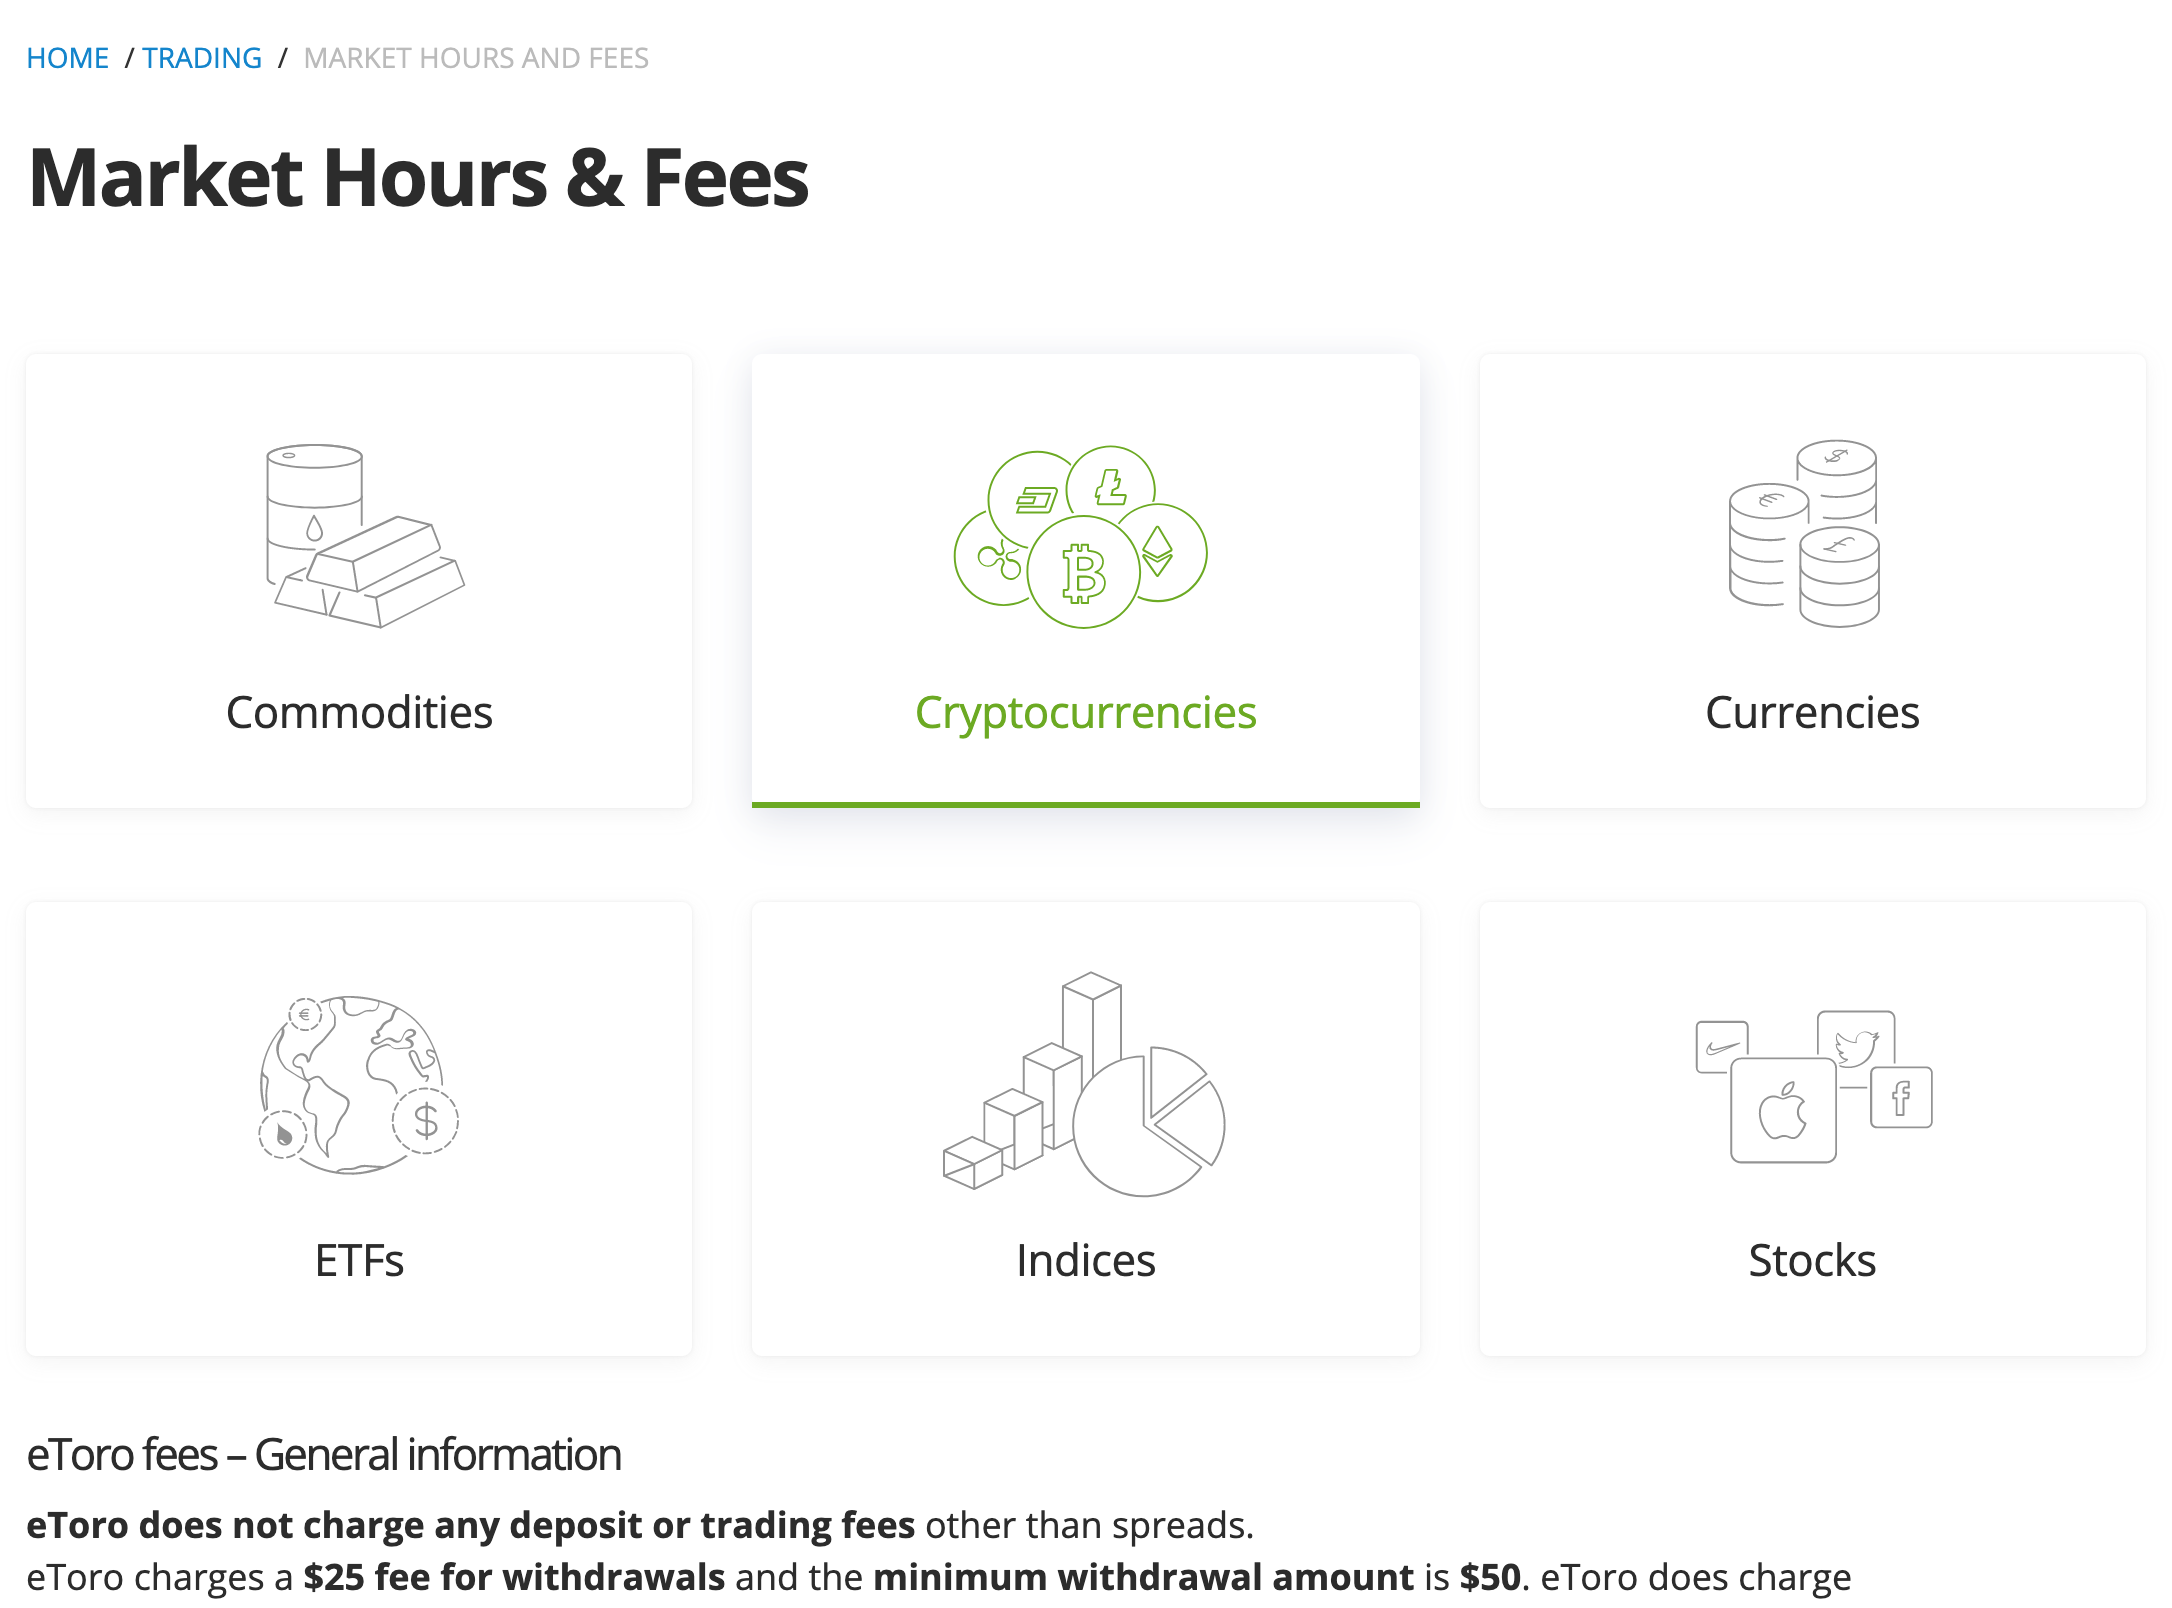 the fees page on eToro